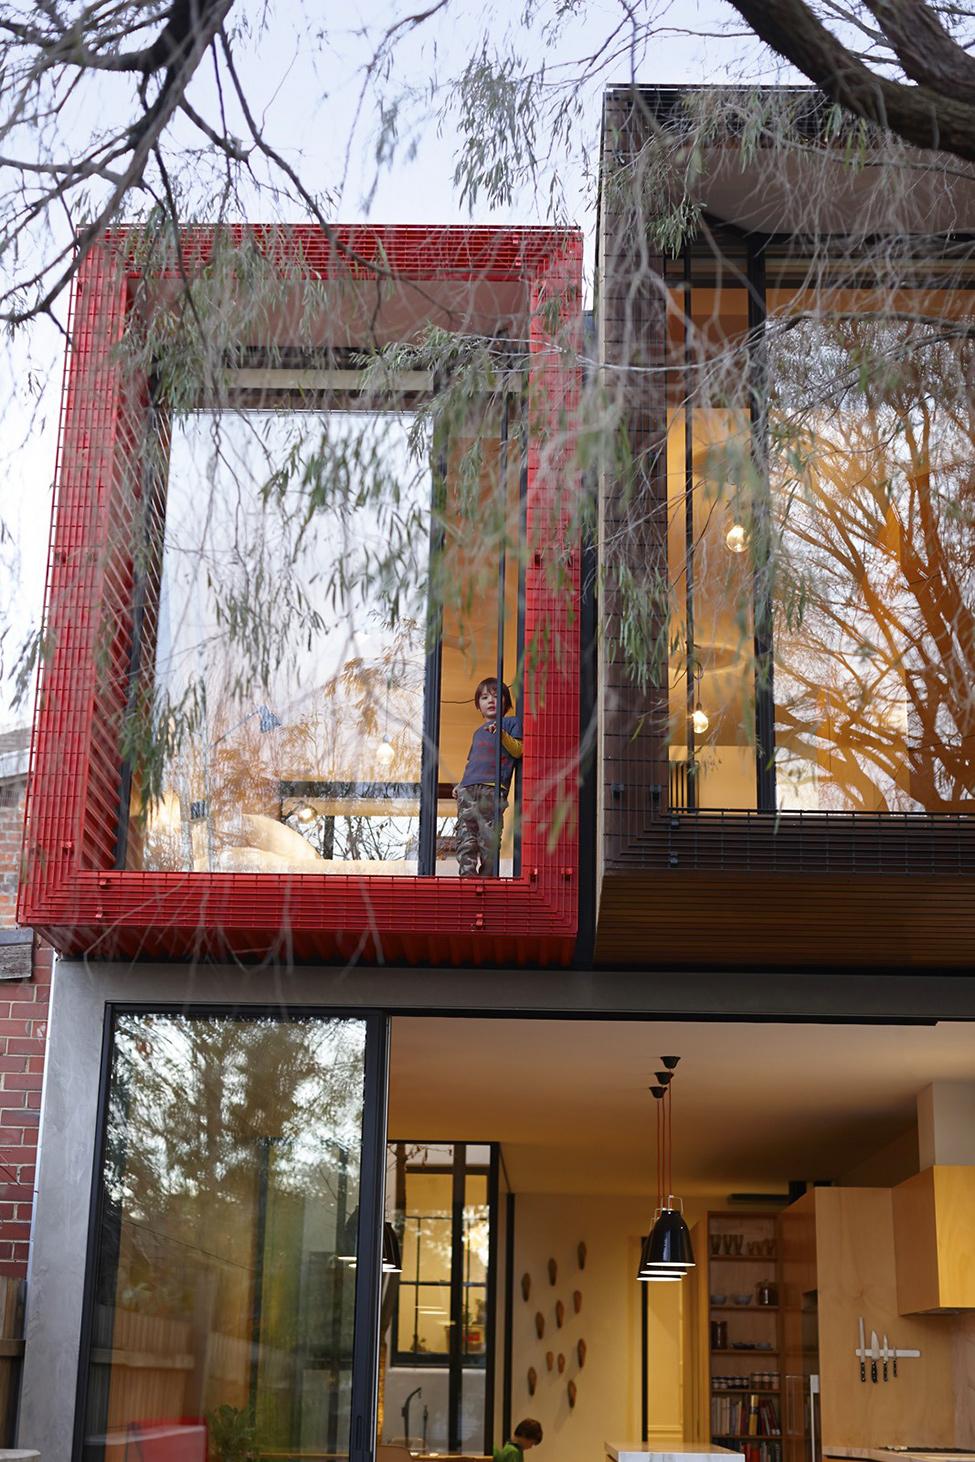 renovate classic to modern townhome australia (10)